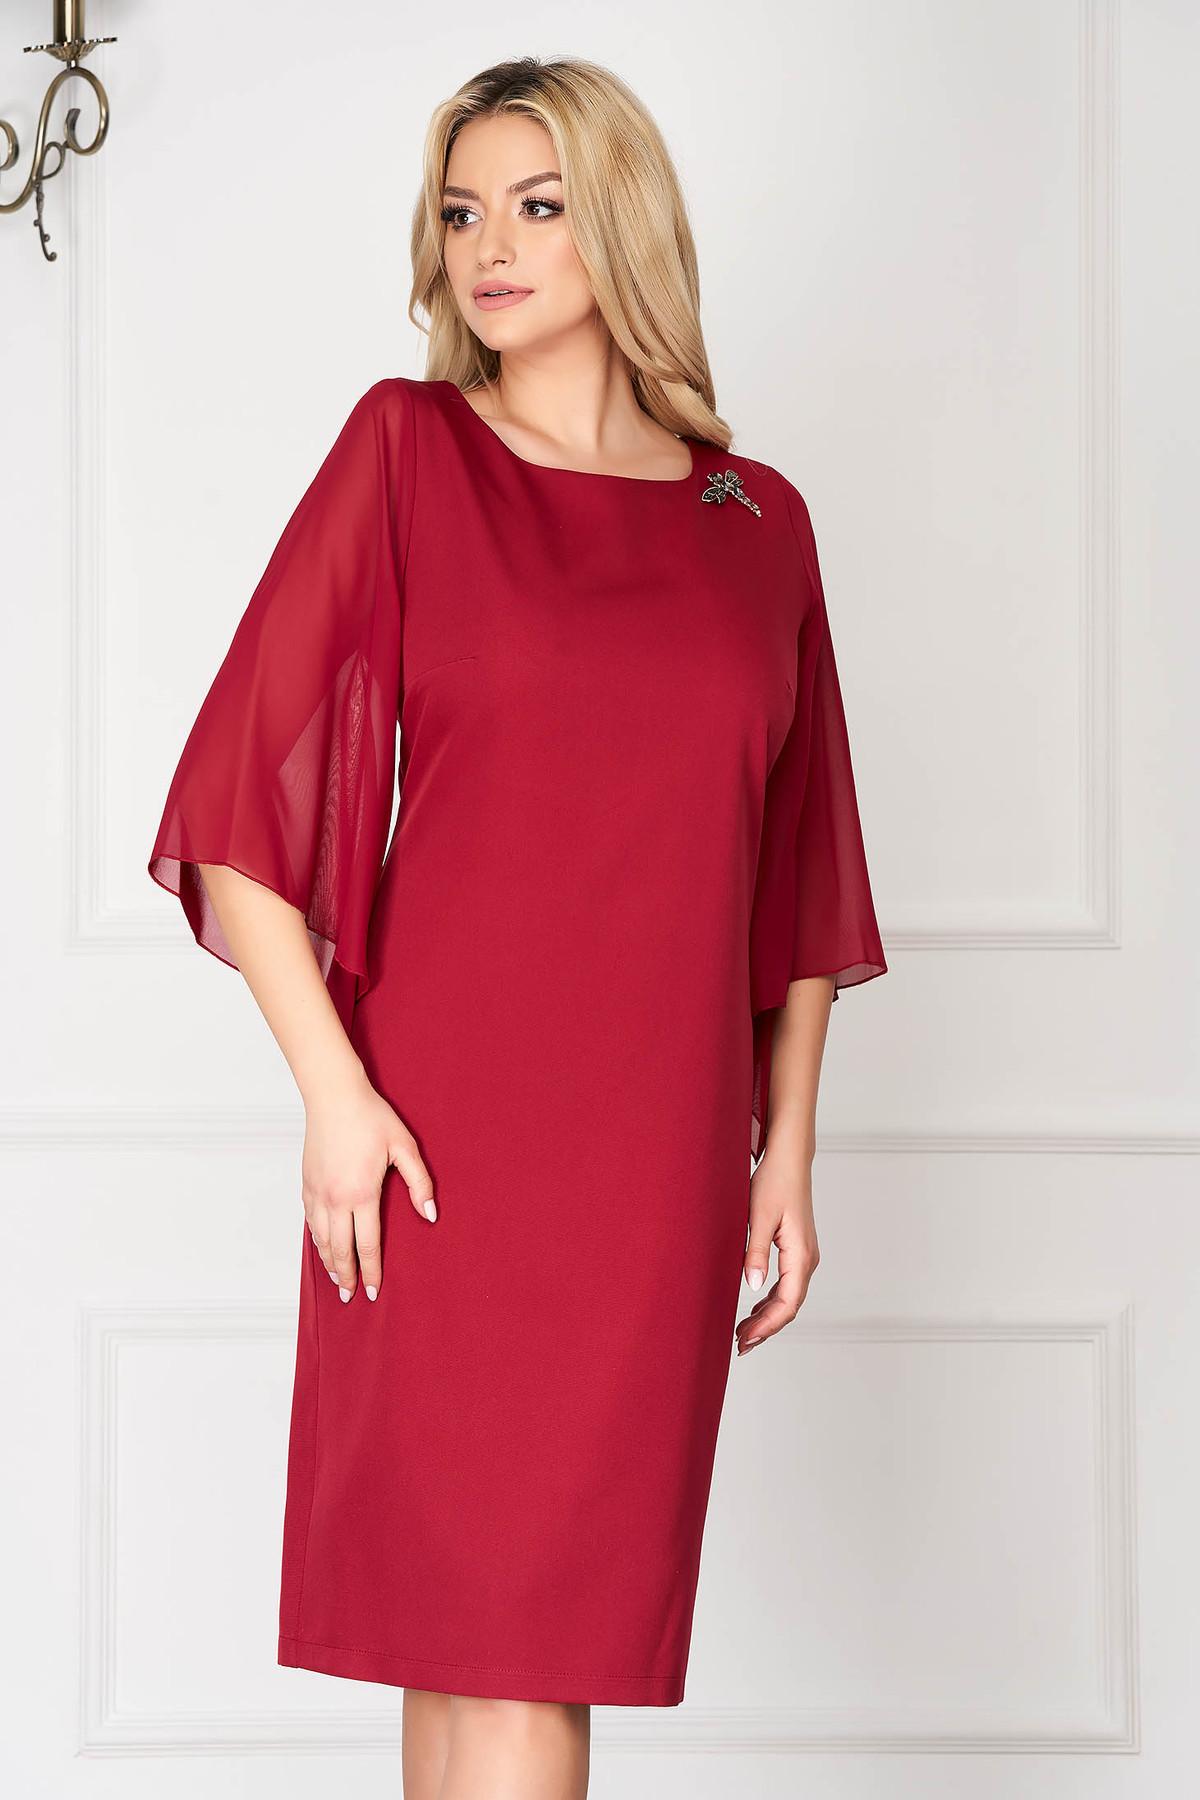 Rochie visinie eleganta midi din stofa cu croi drept si maneci din voal imagine